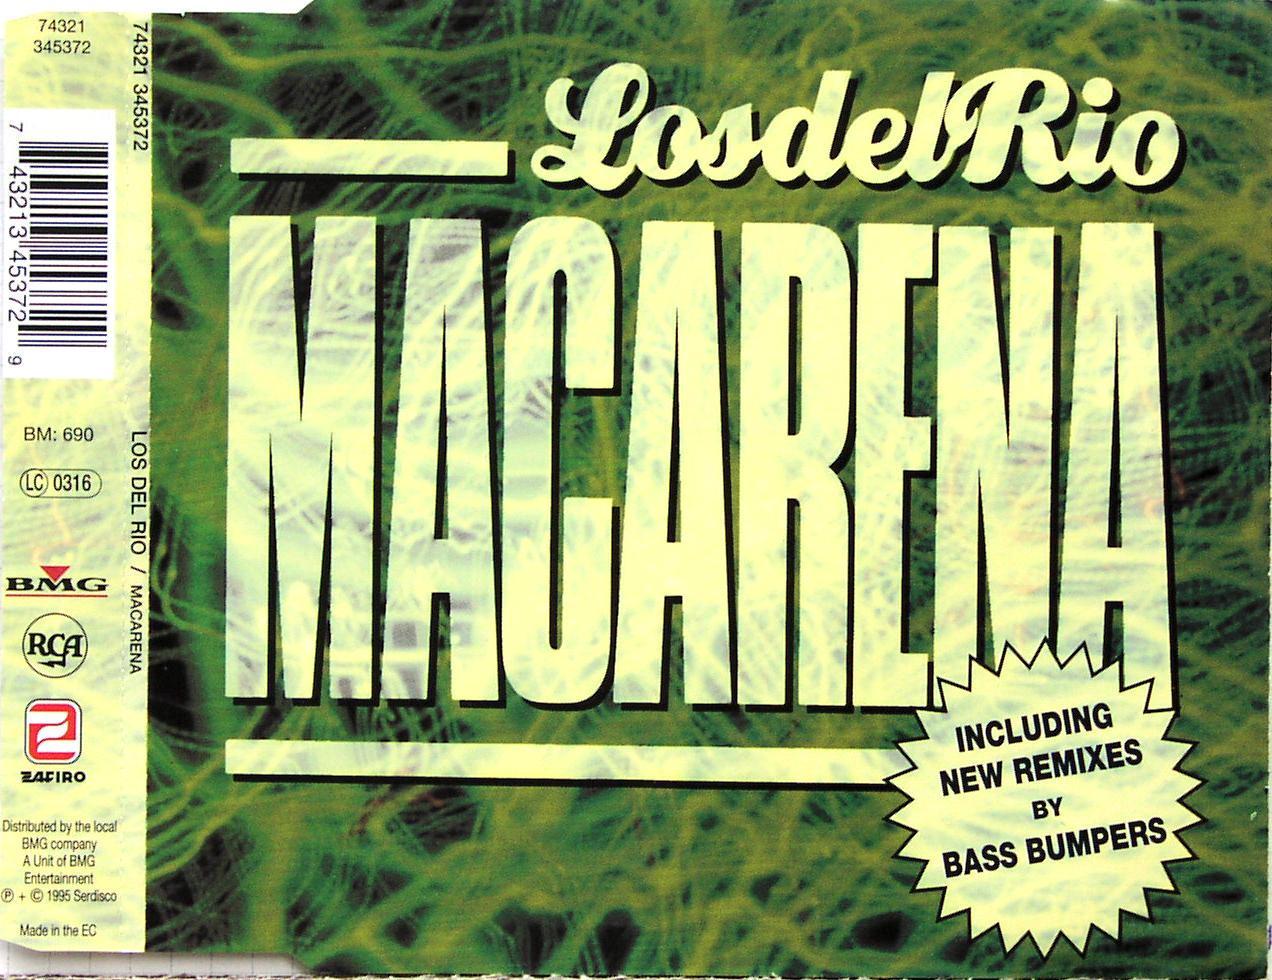 DEL RIO - Macarena - CD Maxi